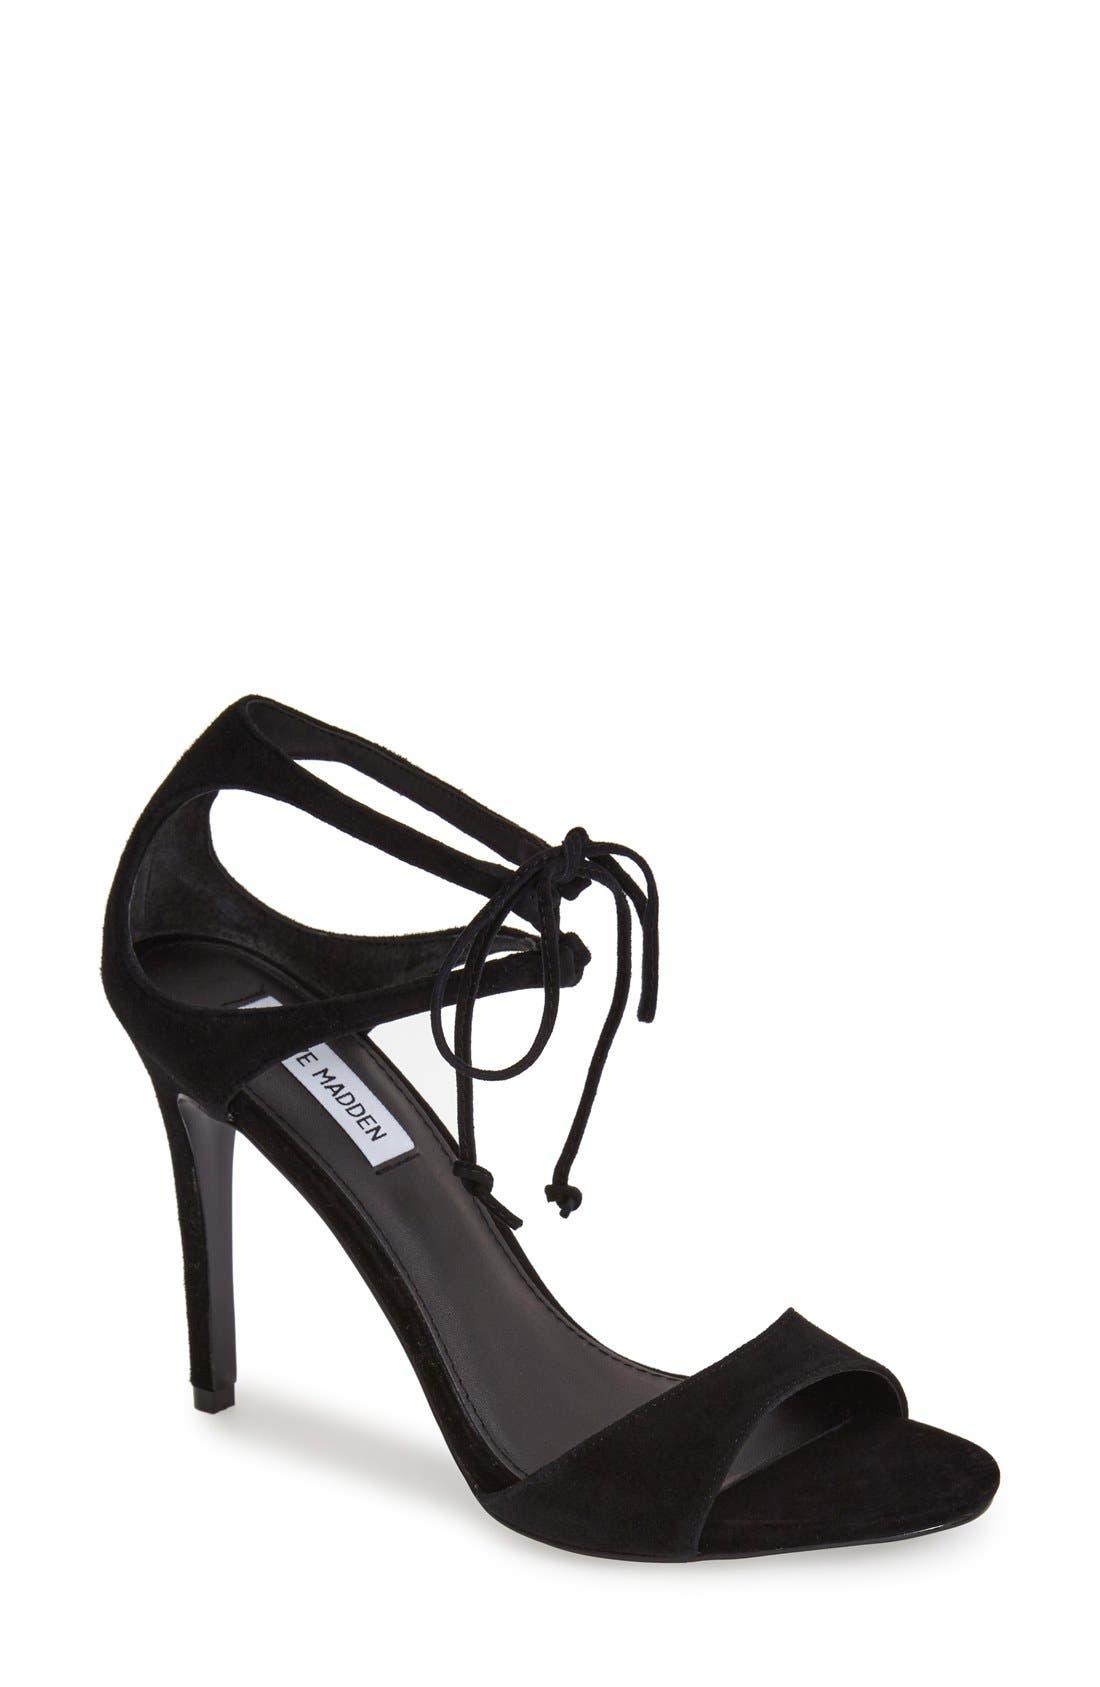 'Semona' Suede Ankle Strap Sandal, Main, color, 001